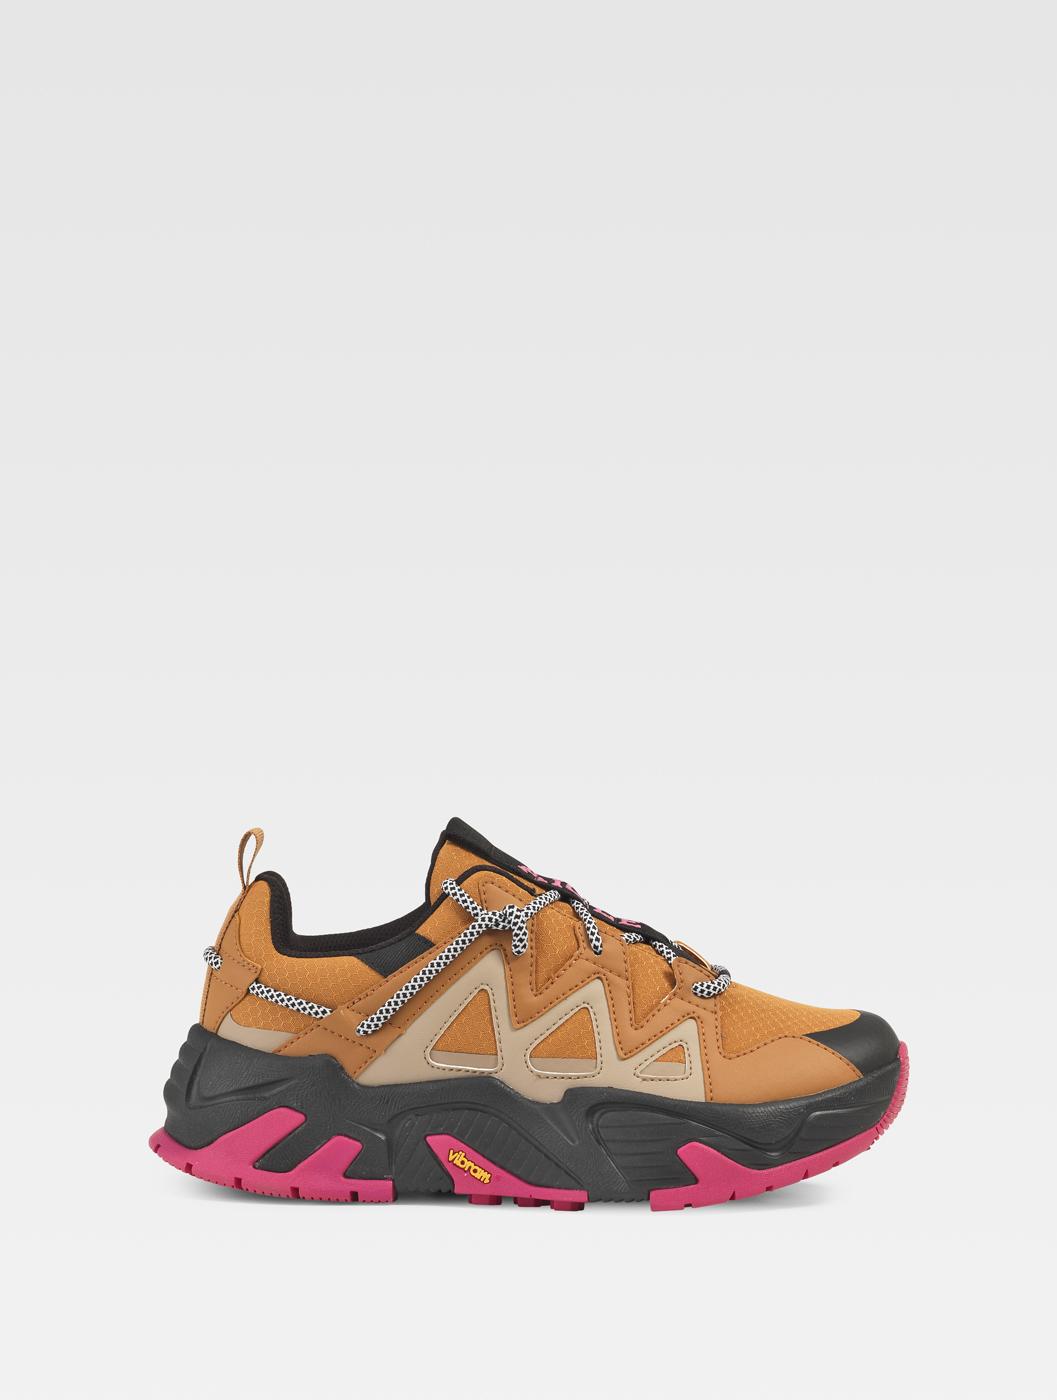 La sneaker Vibram® polyvalente. - Guino mesh